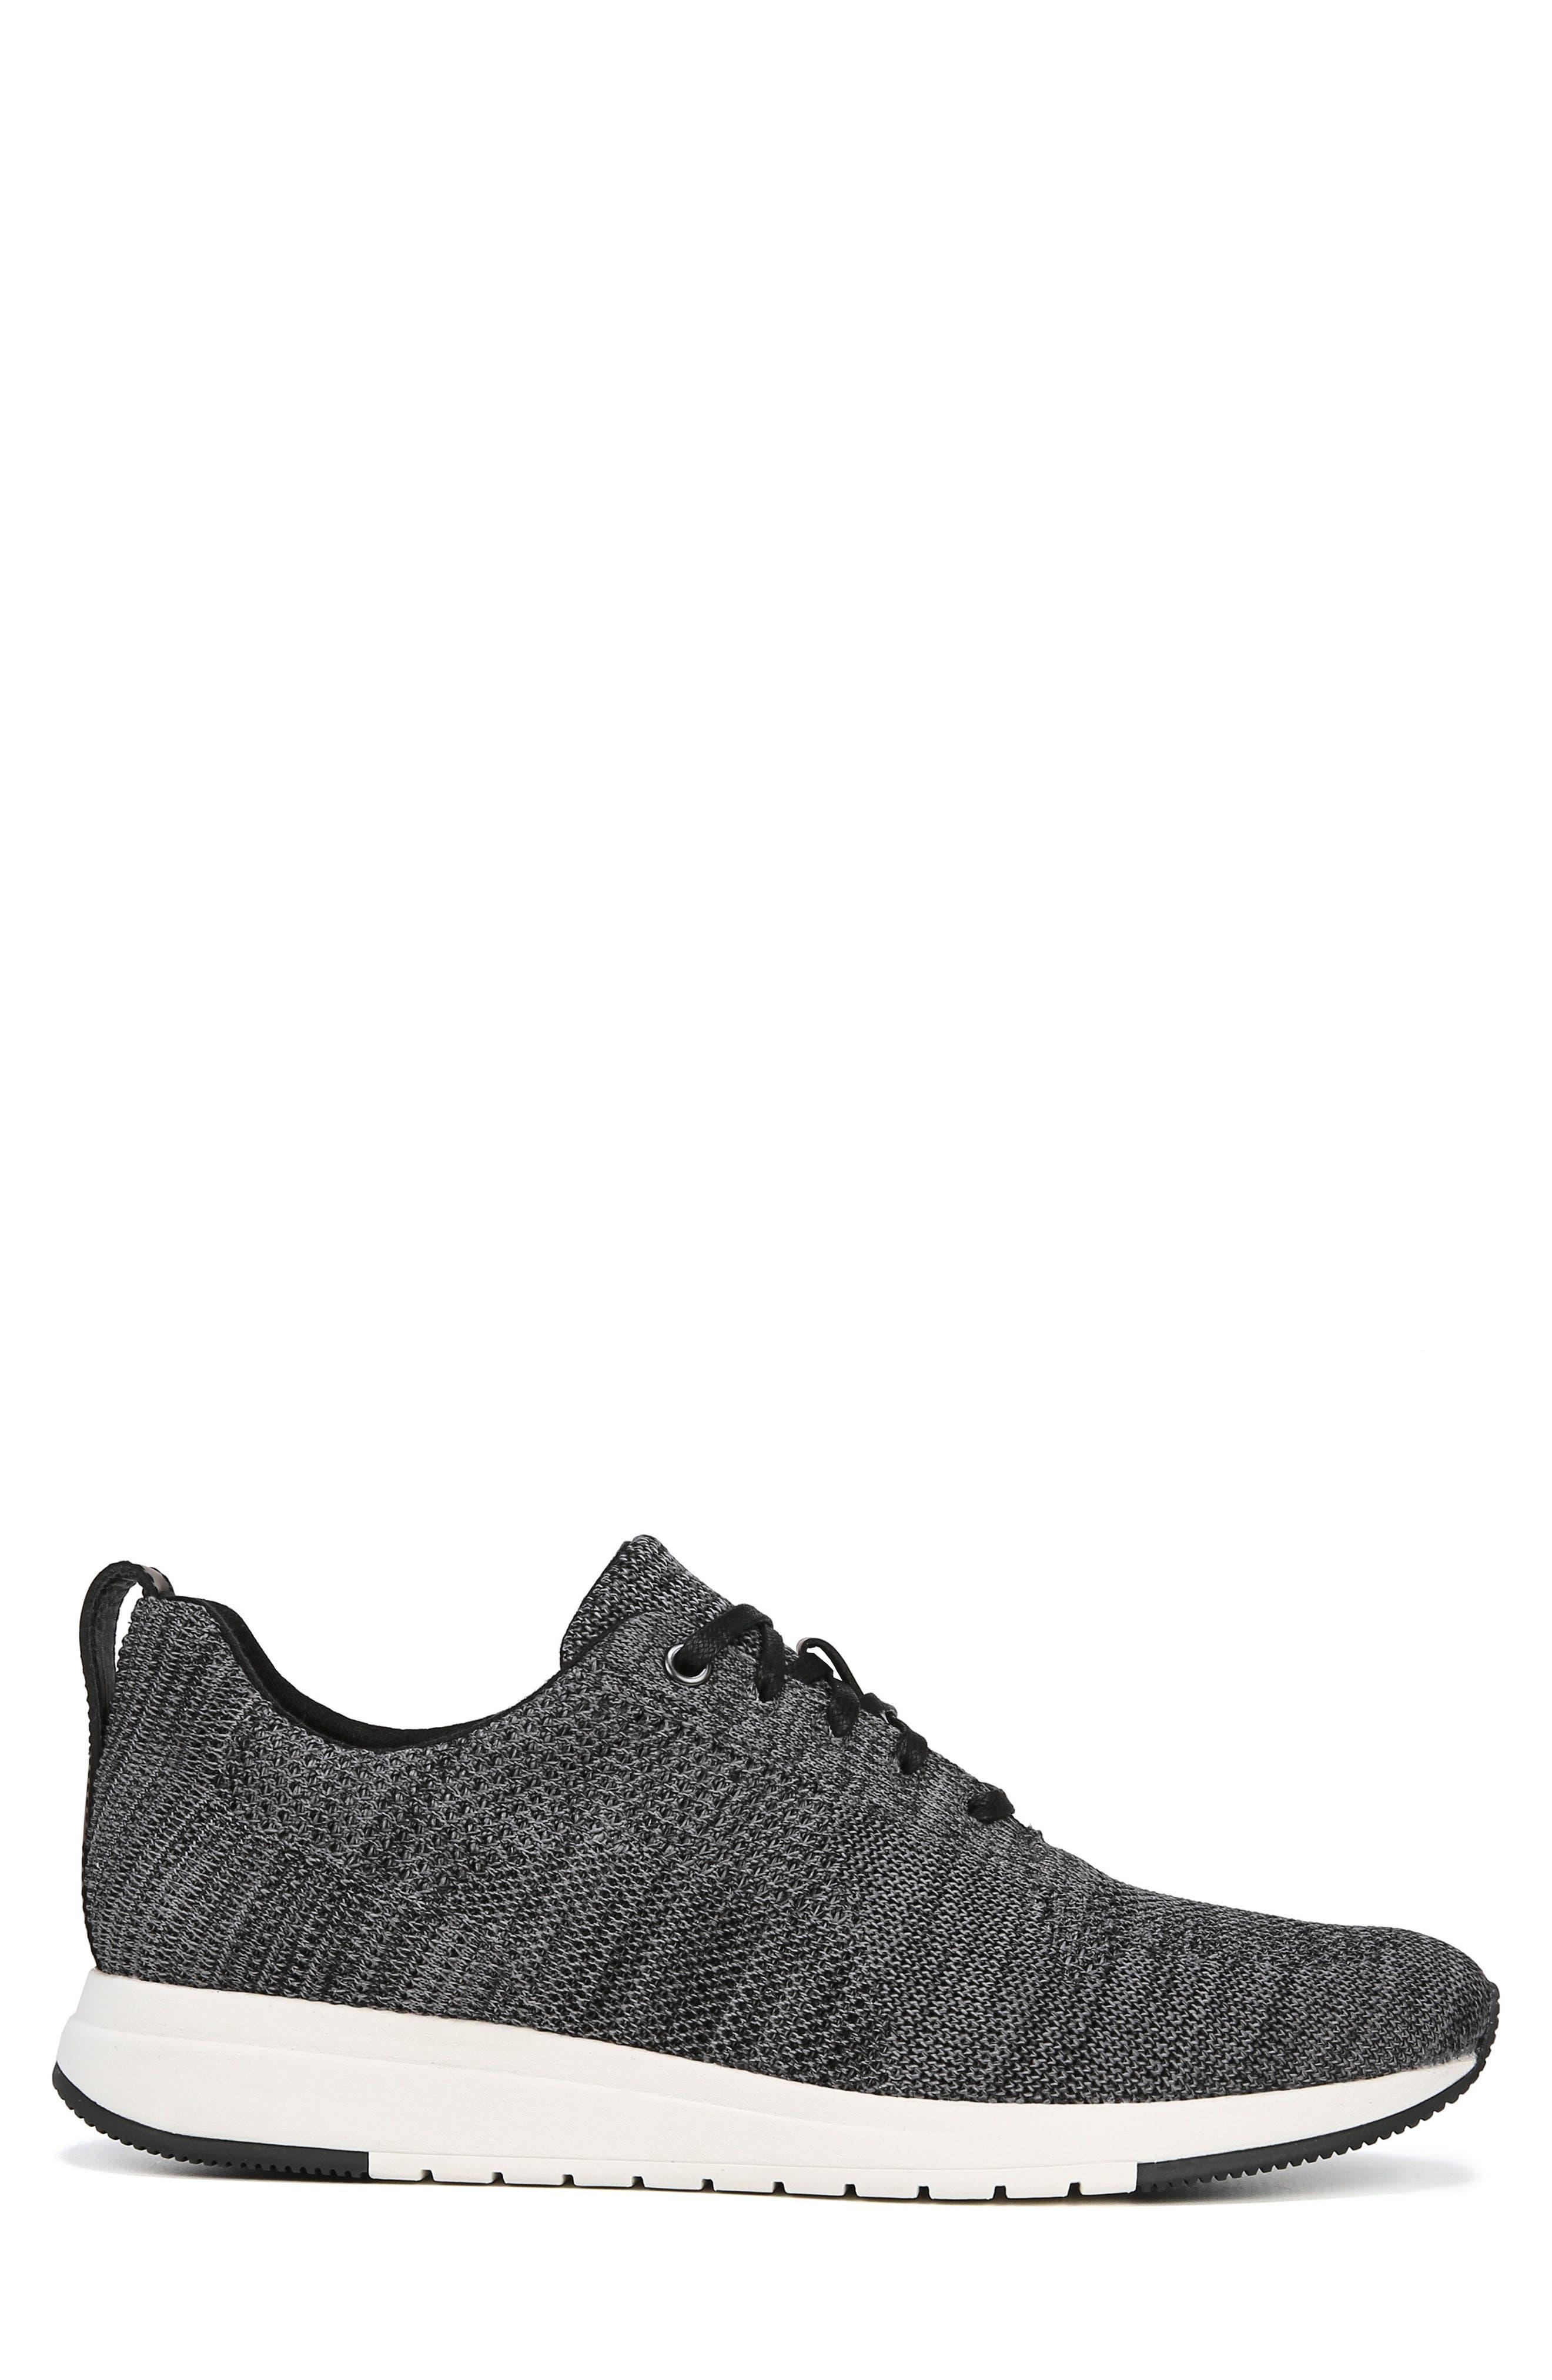 Palo Knit Sneaker,                             Alternate thumbnail 3, color,                             MARL GREY/ BLACK